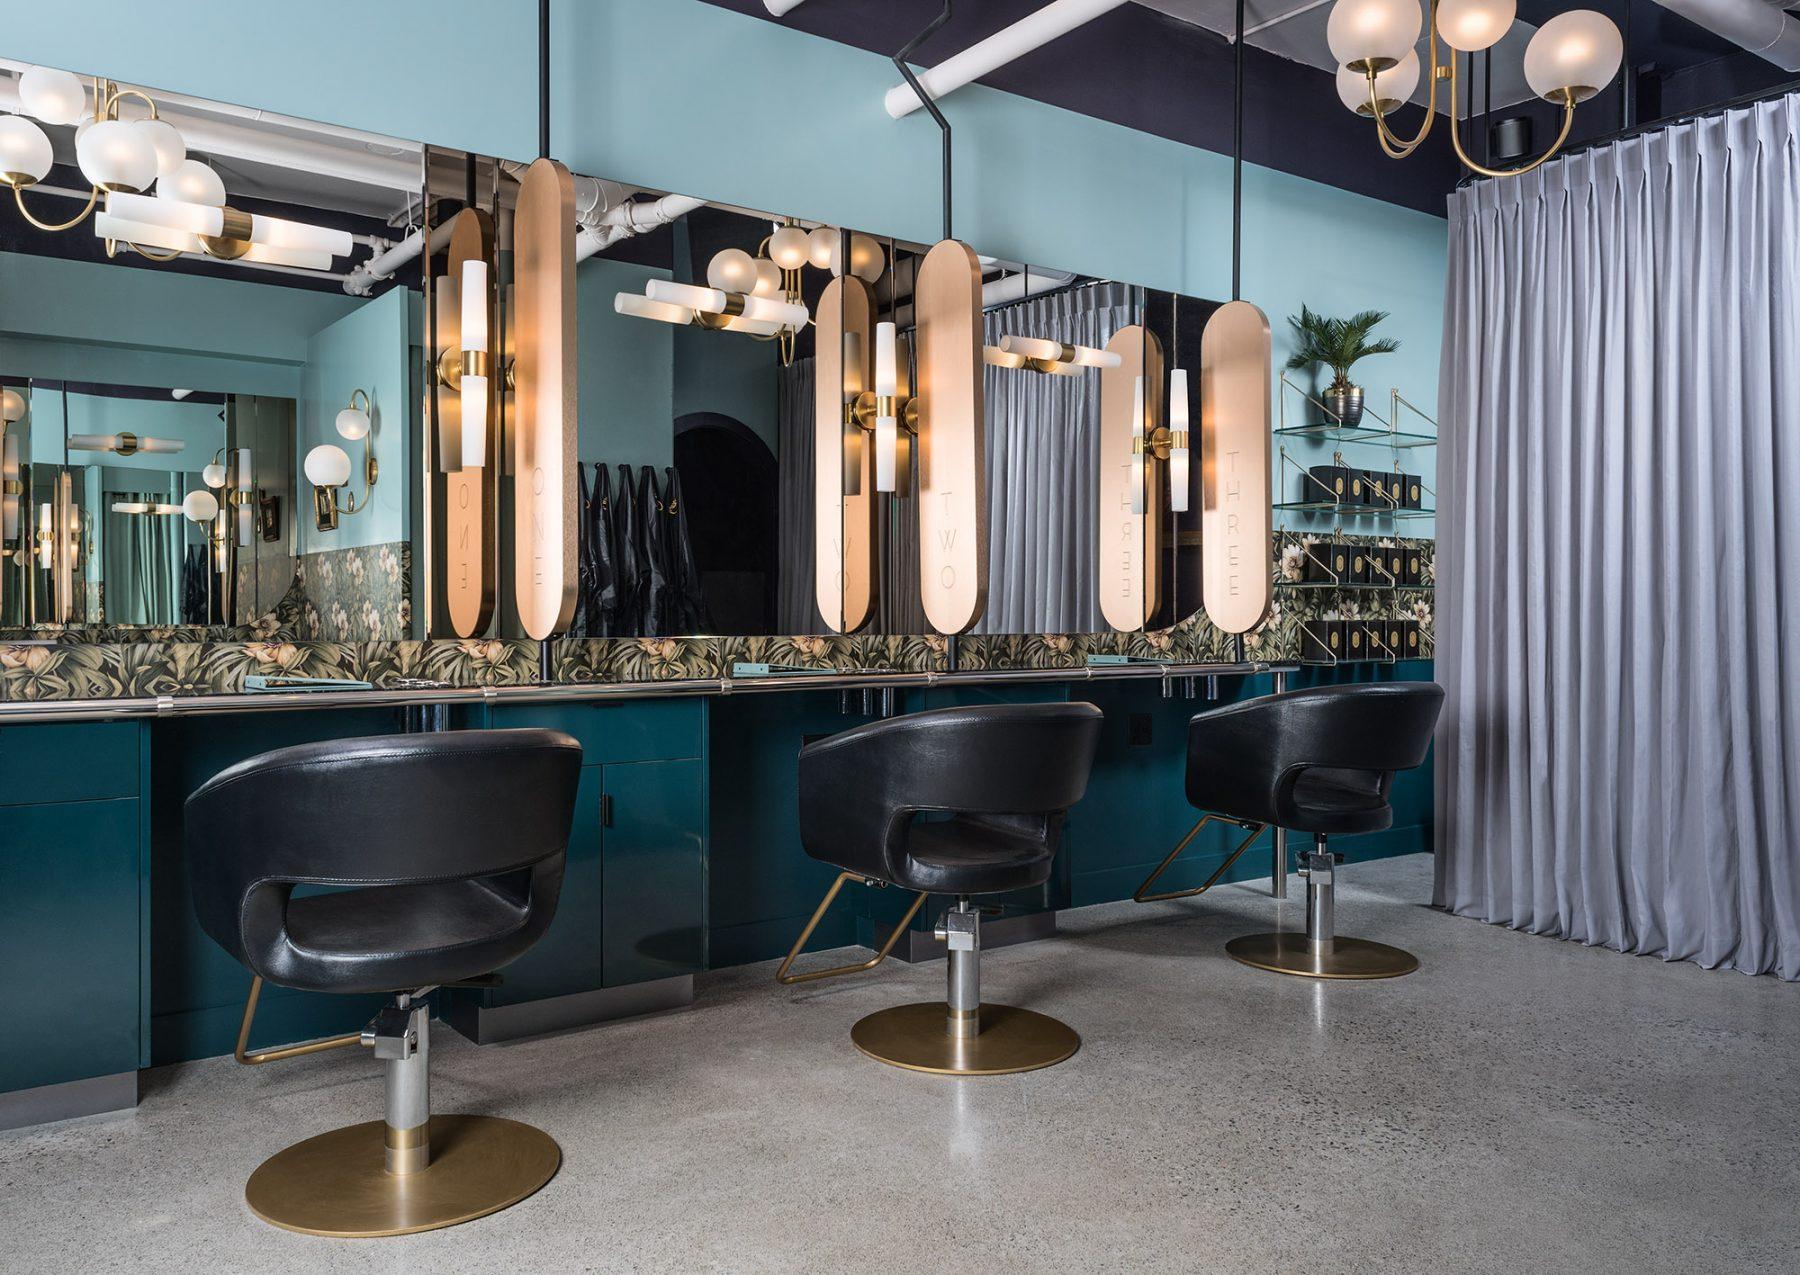 Kb glamoury widechairs